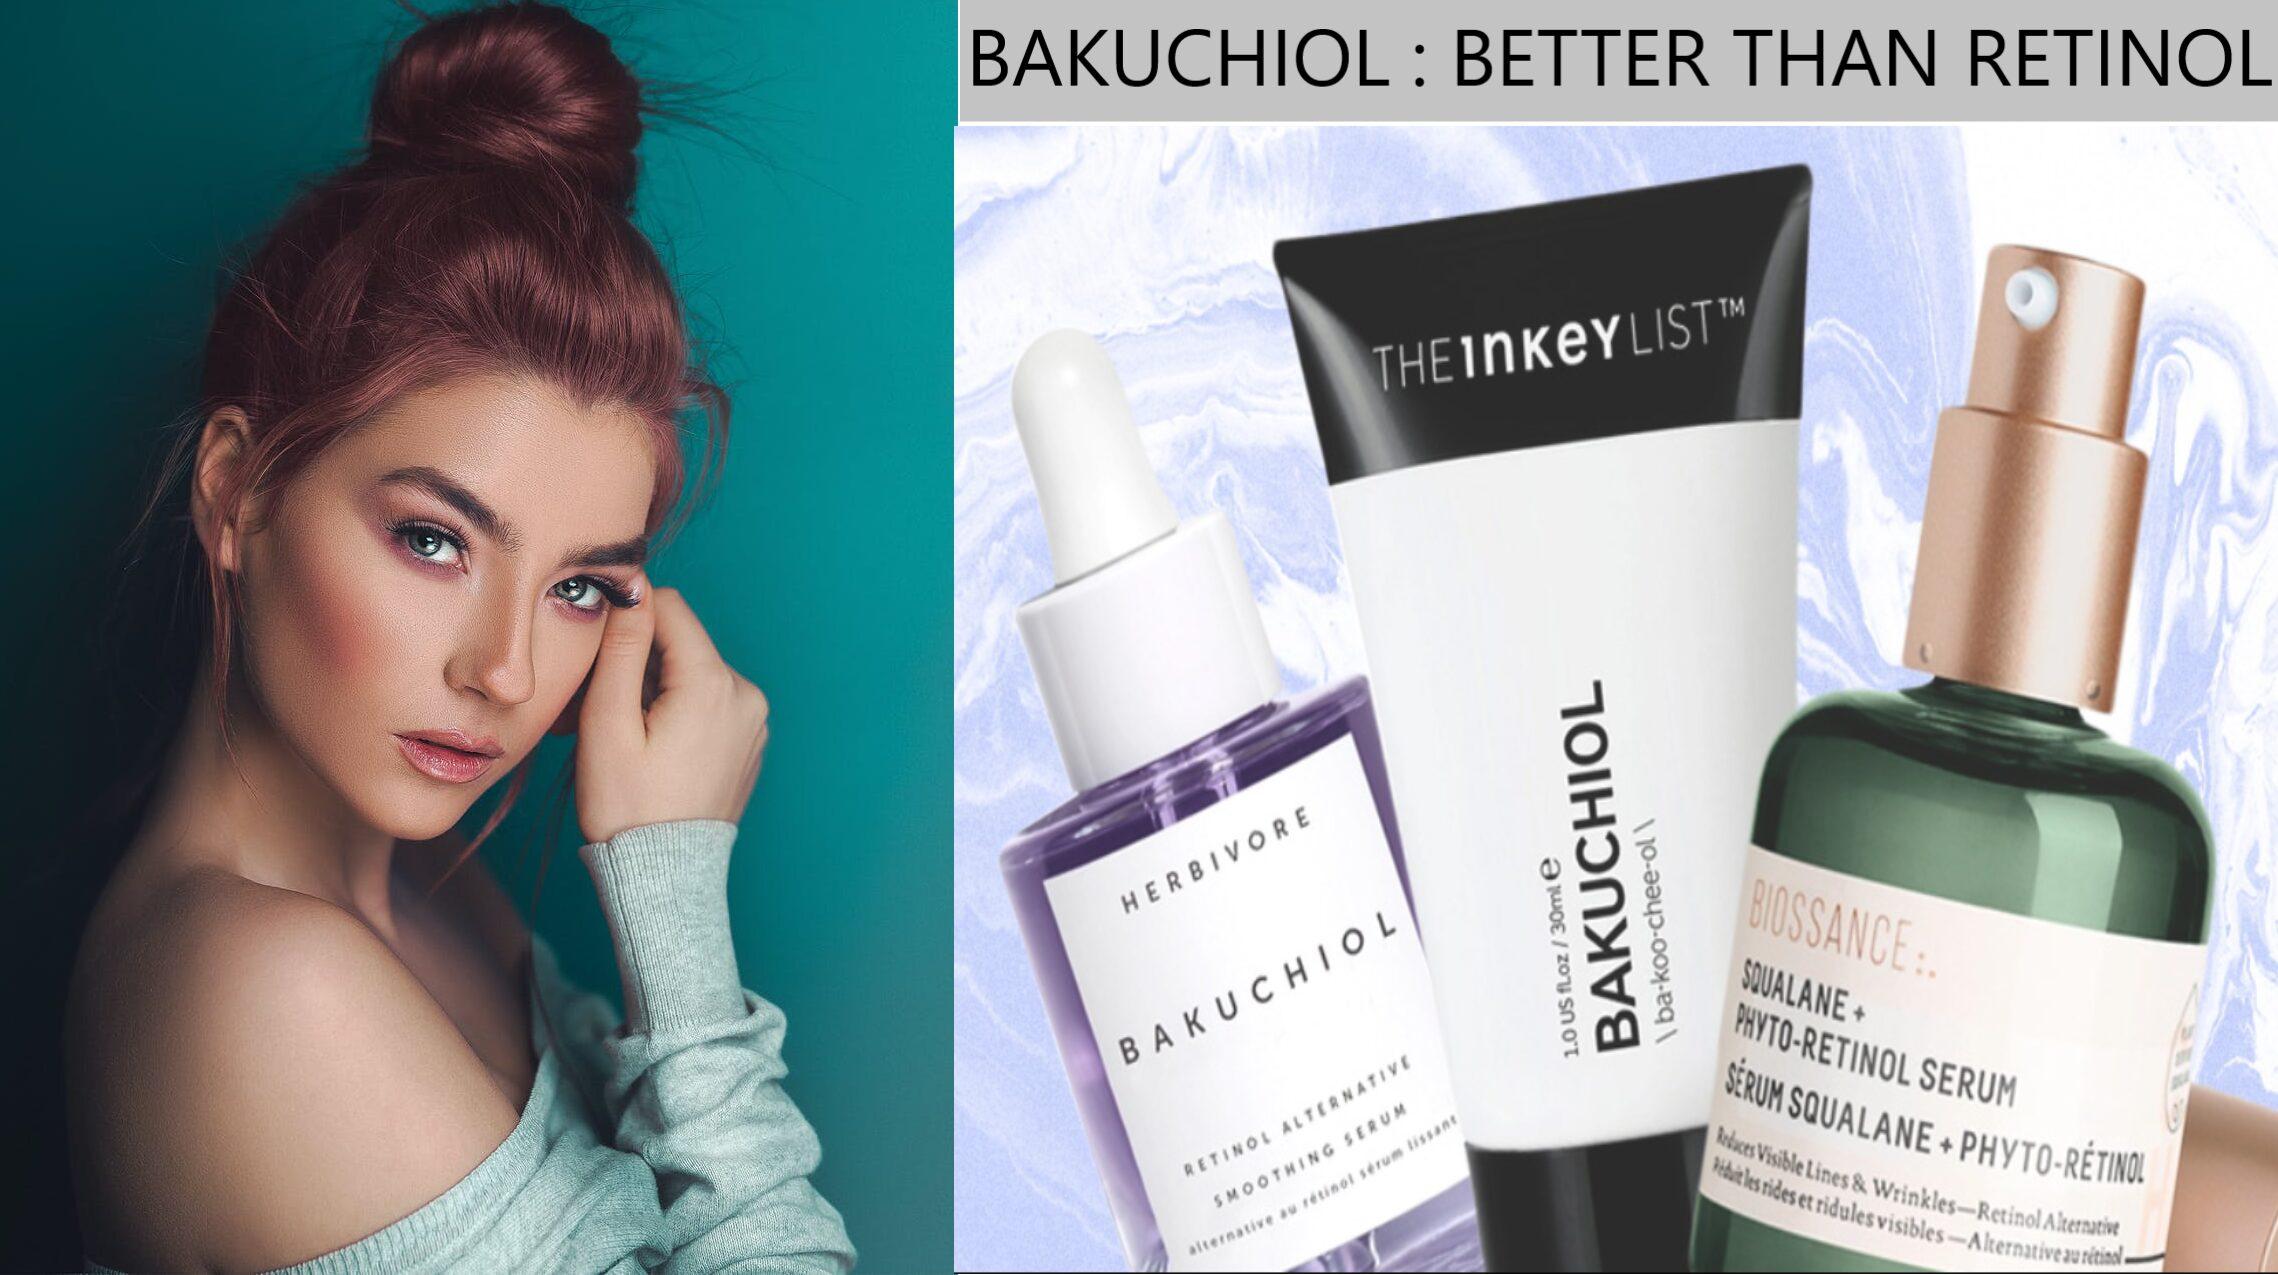 Is Bakuchiol better than retinol